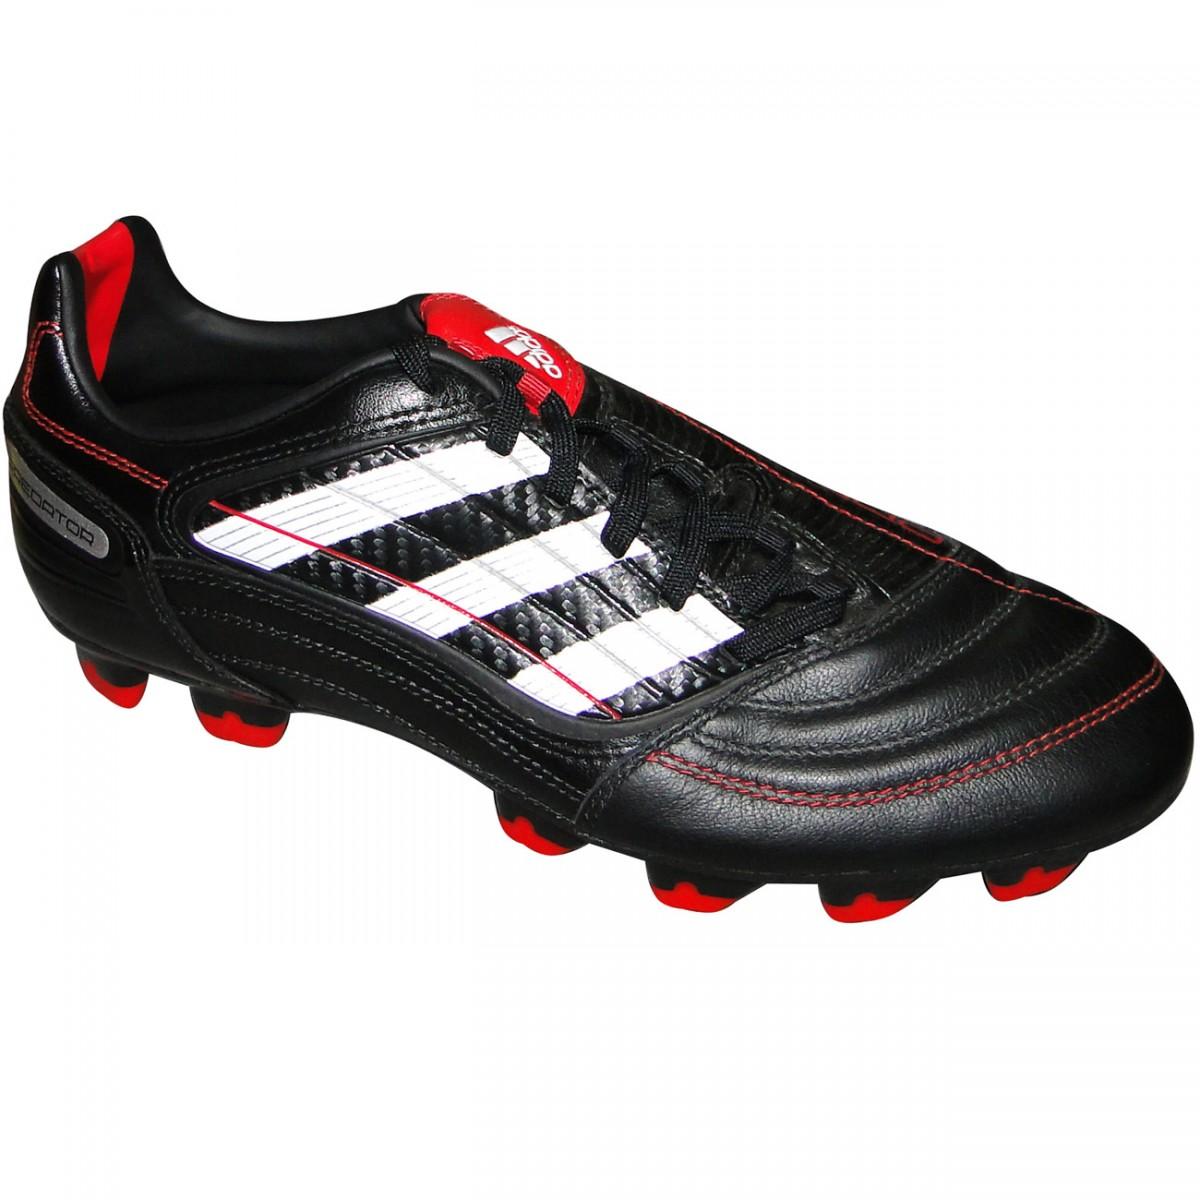 9b0b2fd13c651 Chuteira Adidas Predator Absolado X 4072 - PRETO/BRANCO/VERMELHO - Chuteira  Nike, Adidas. Sandalias Femininas. Sandy Calçados